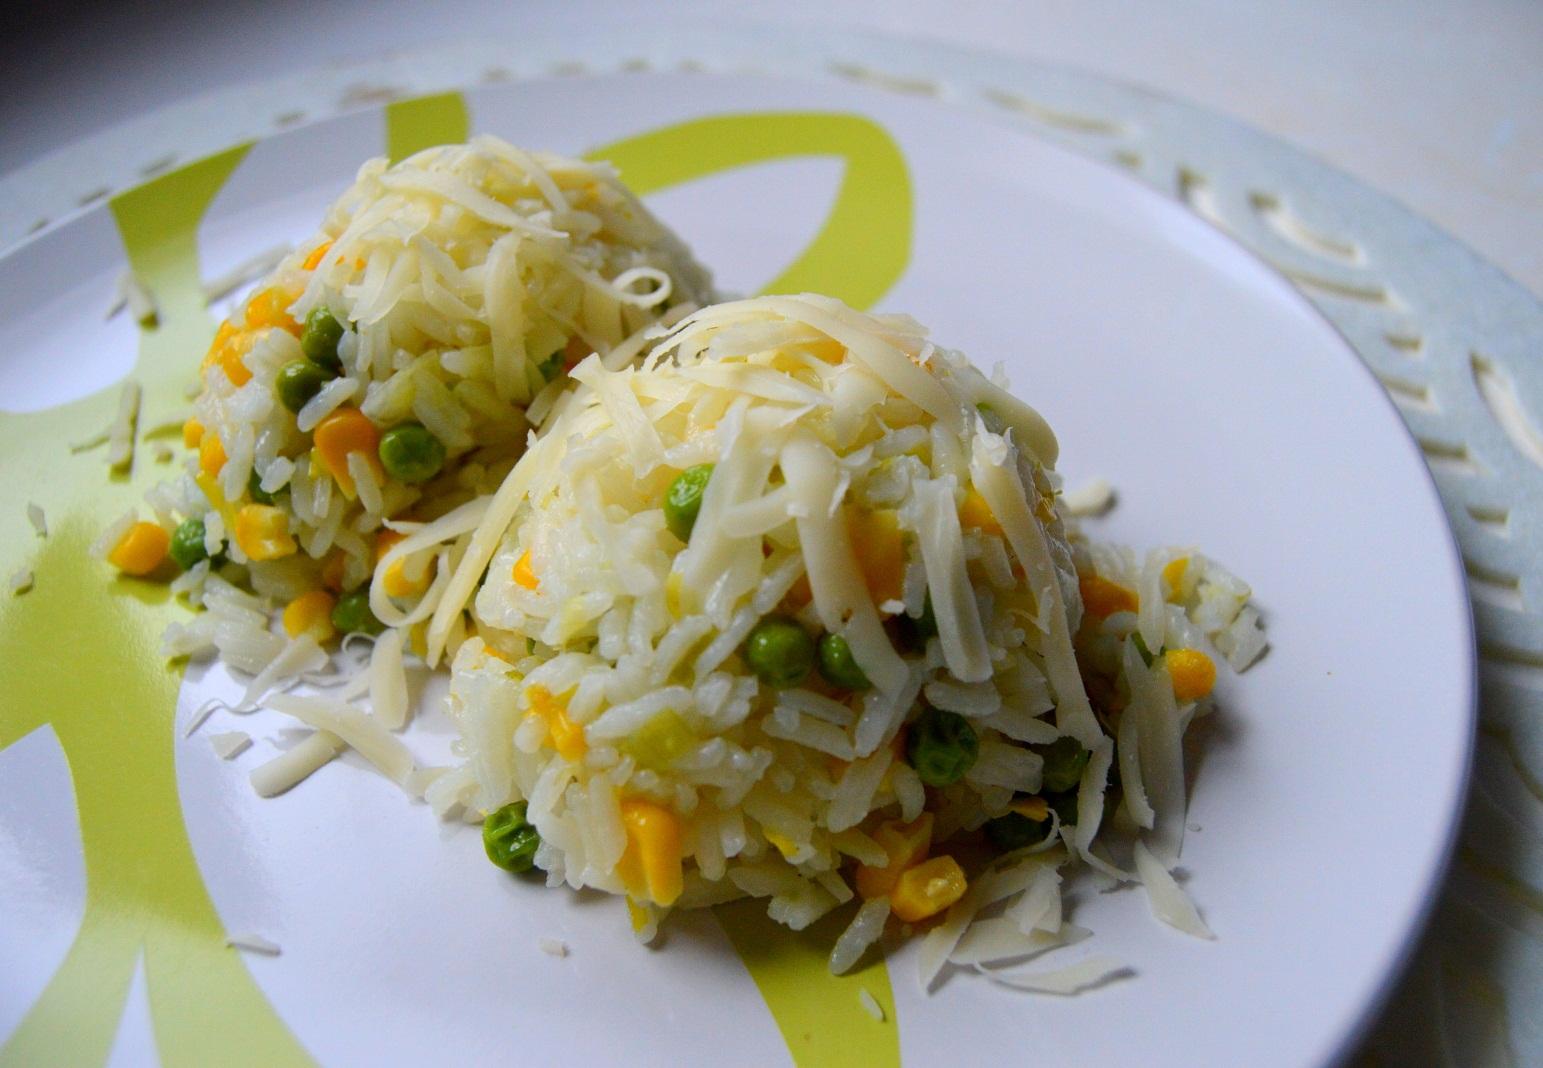 Zeleninové rizoto z jasmínové rýže